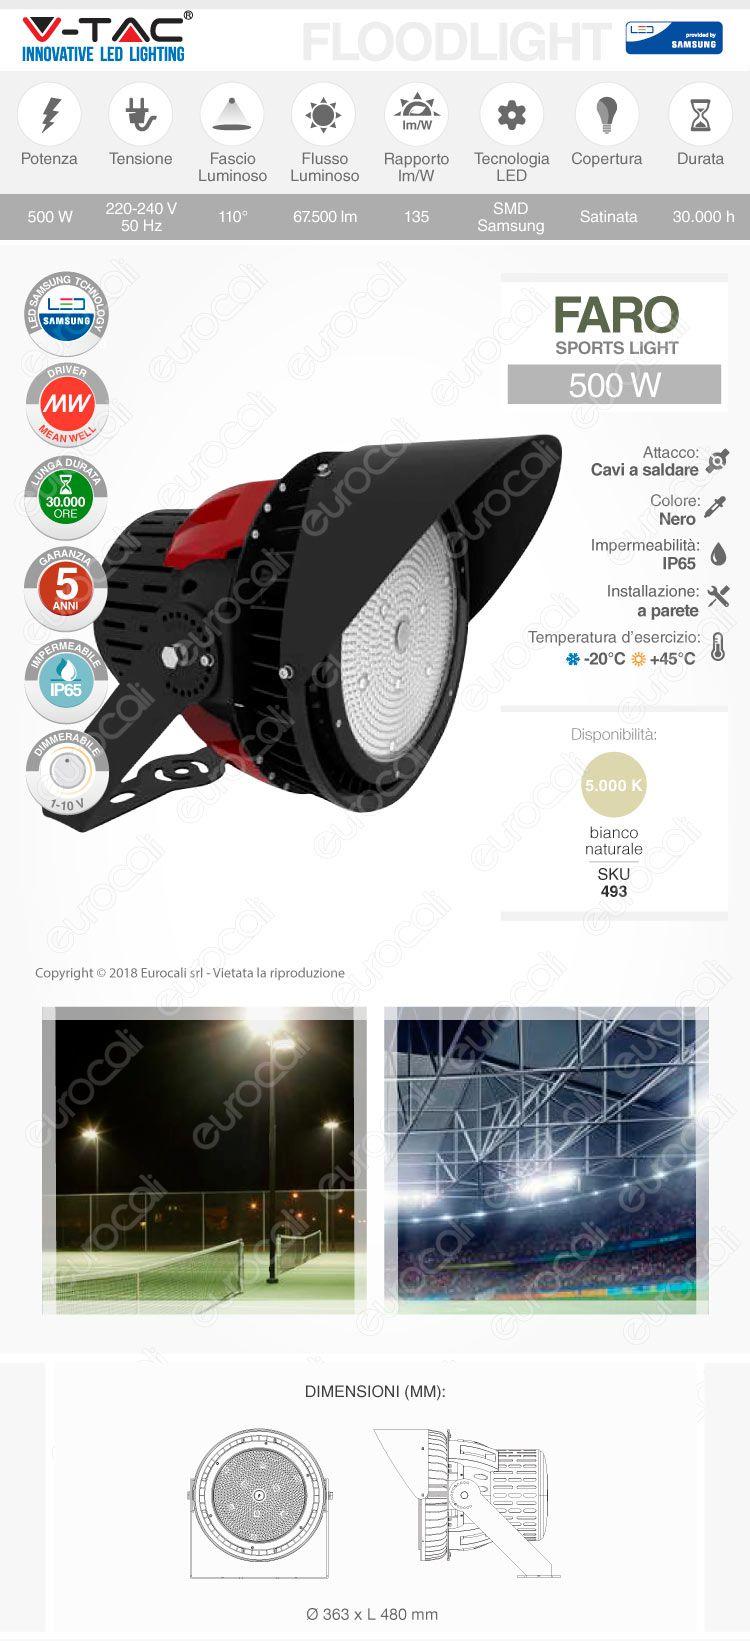 V-Tac VT-501D Faro LED 110° Sport Light 500W SMD Dimmerabile High Bay Chip Samsung